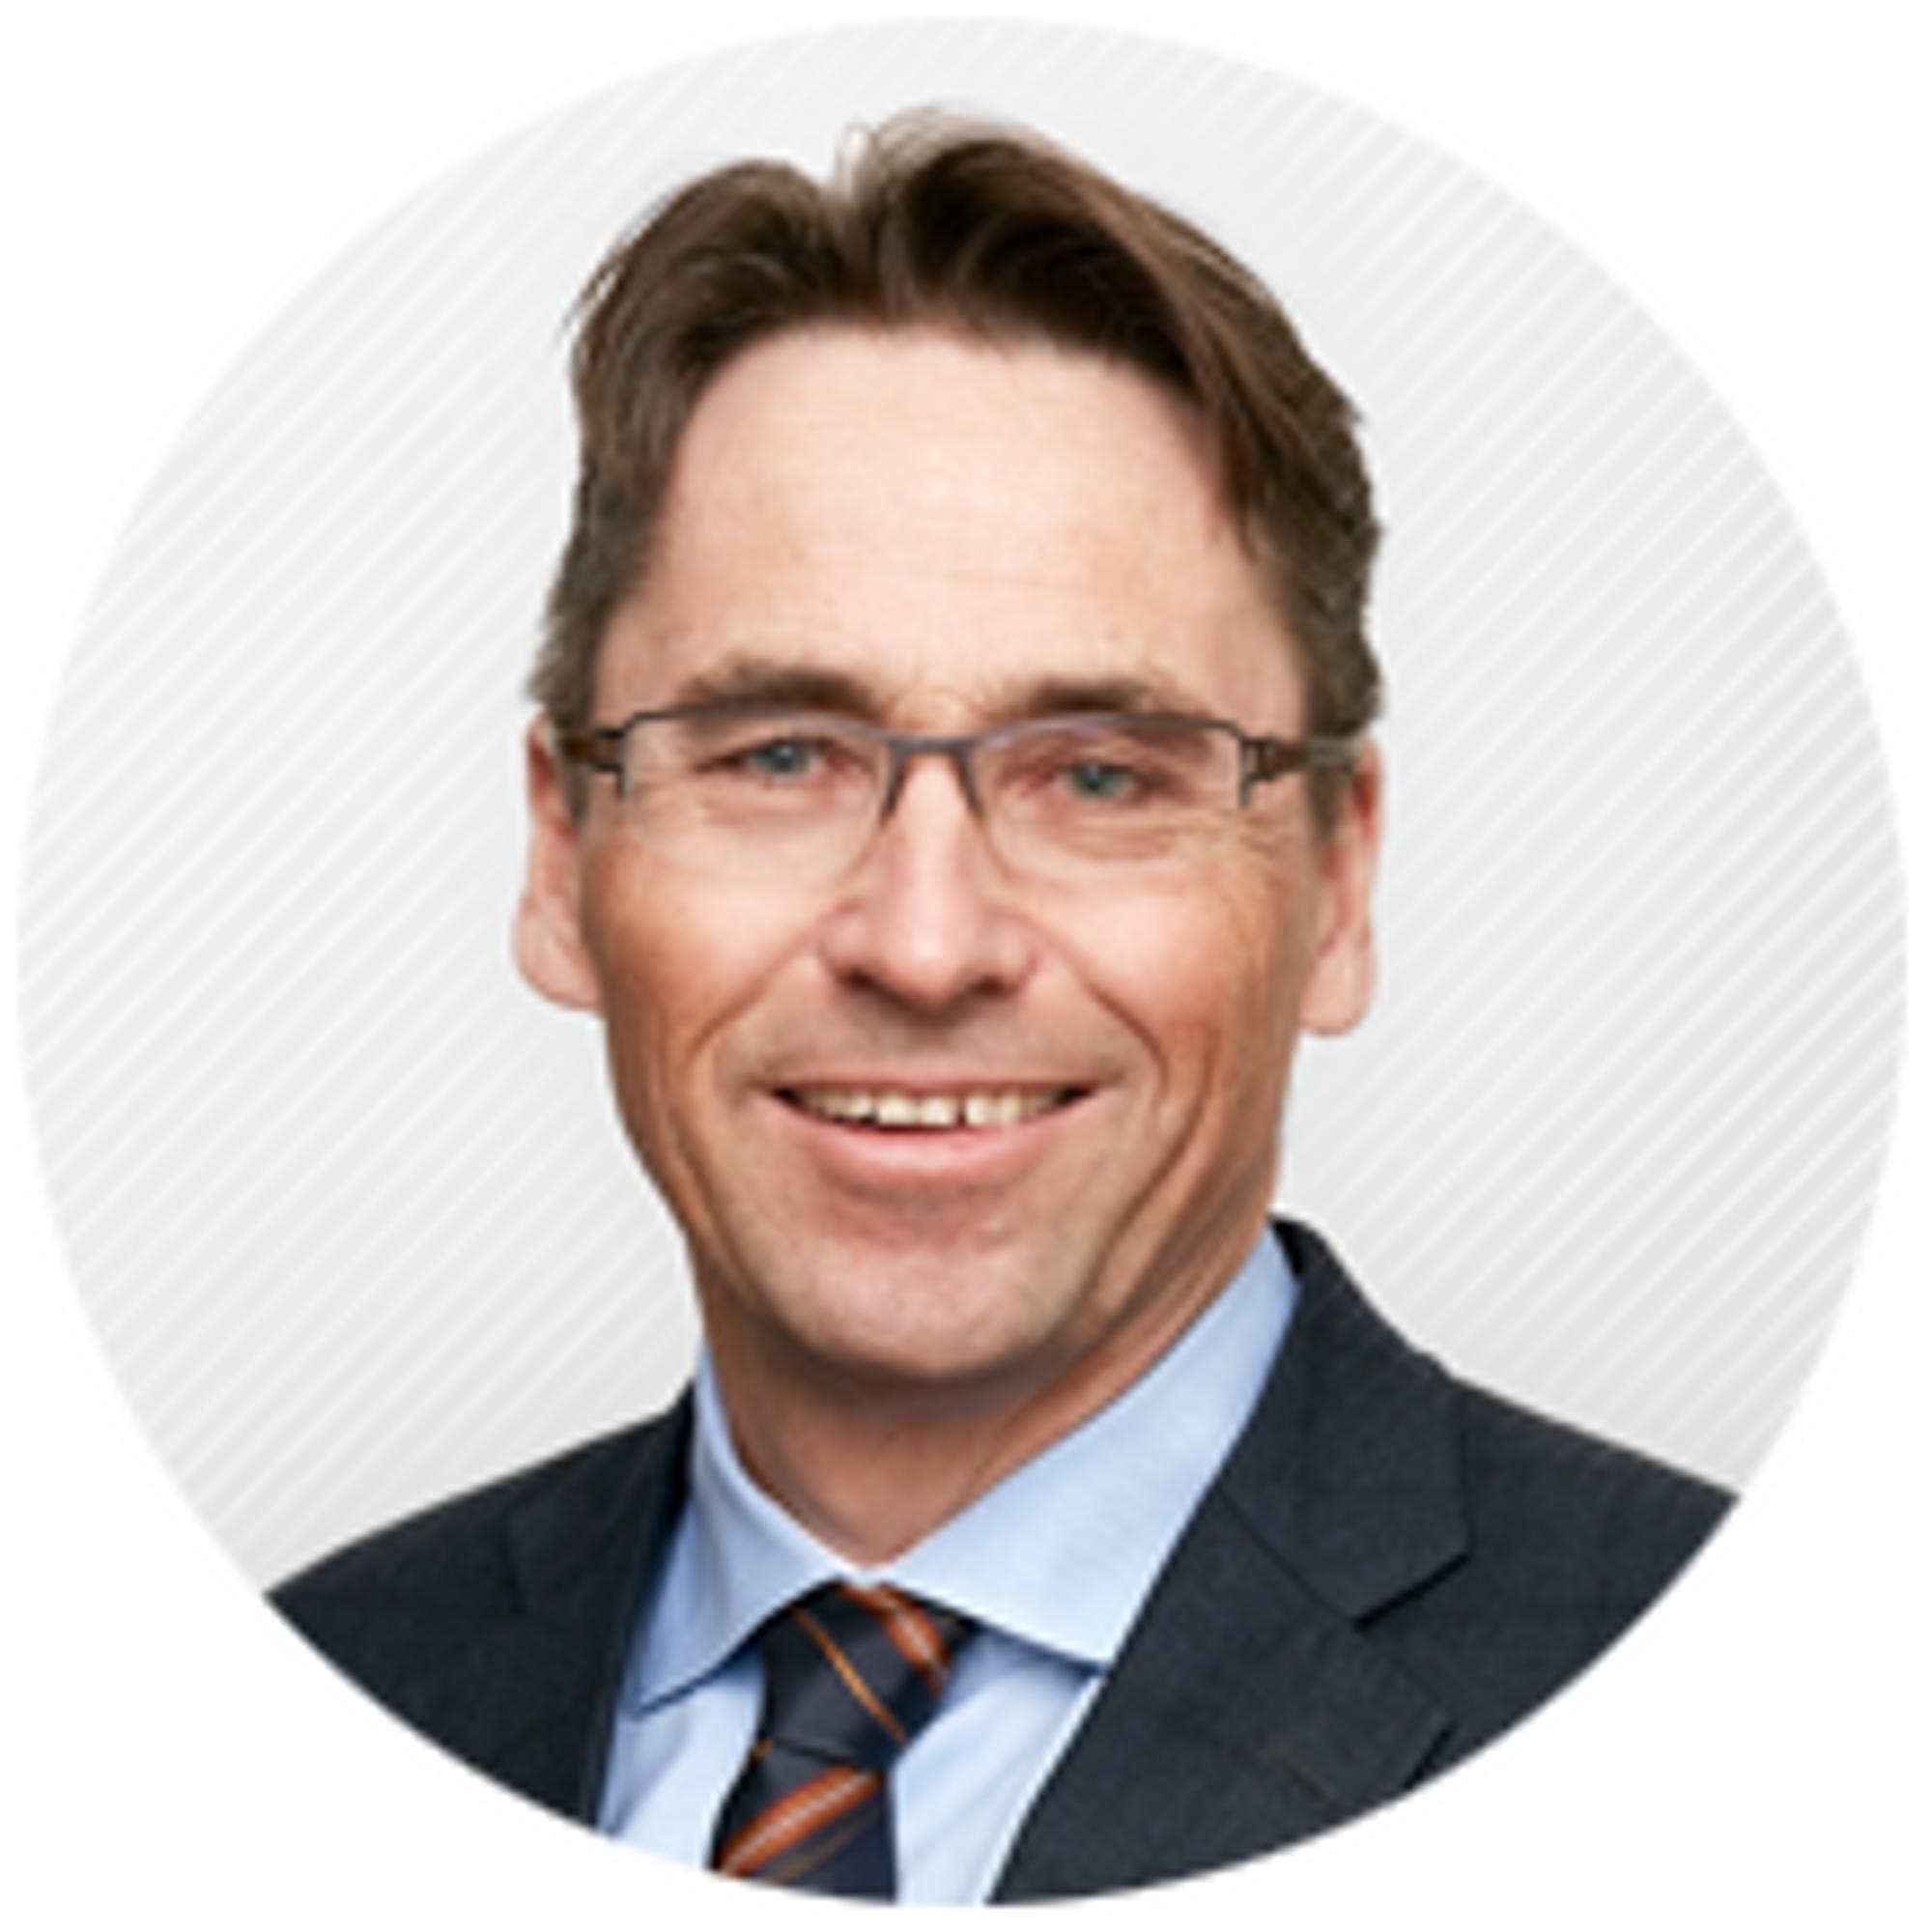 Nils Kristian Einstabland